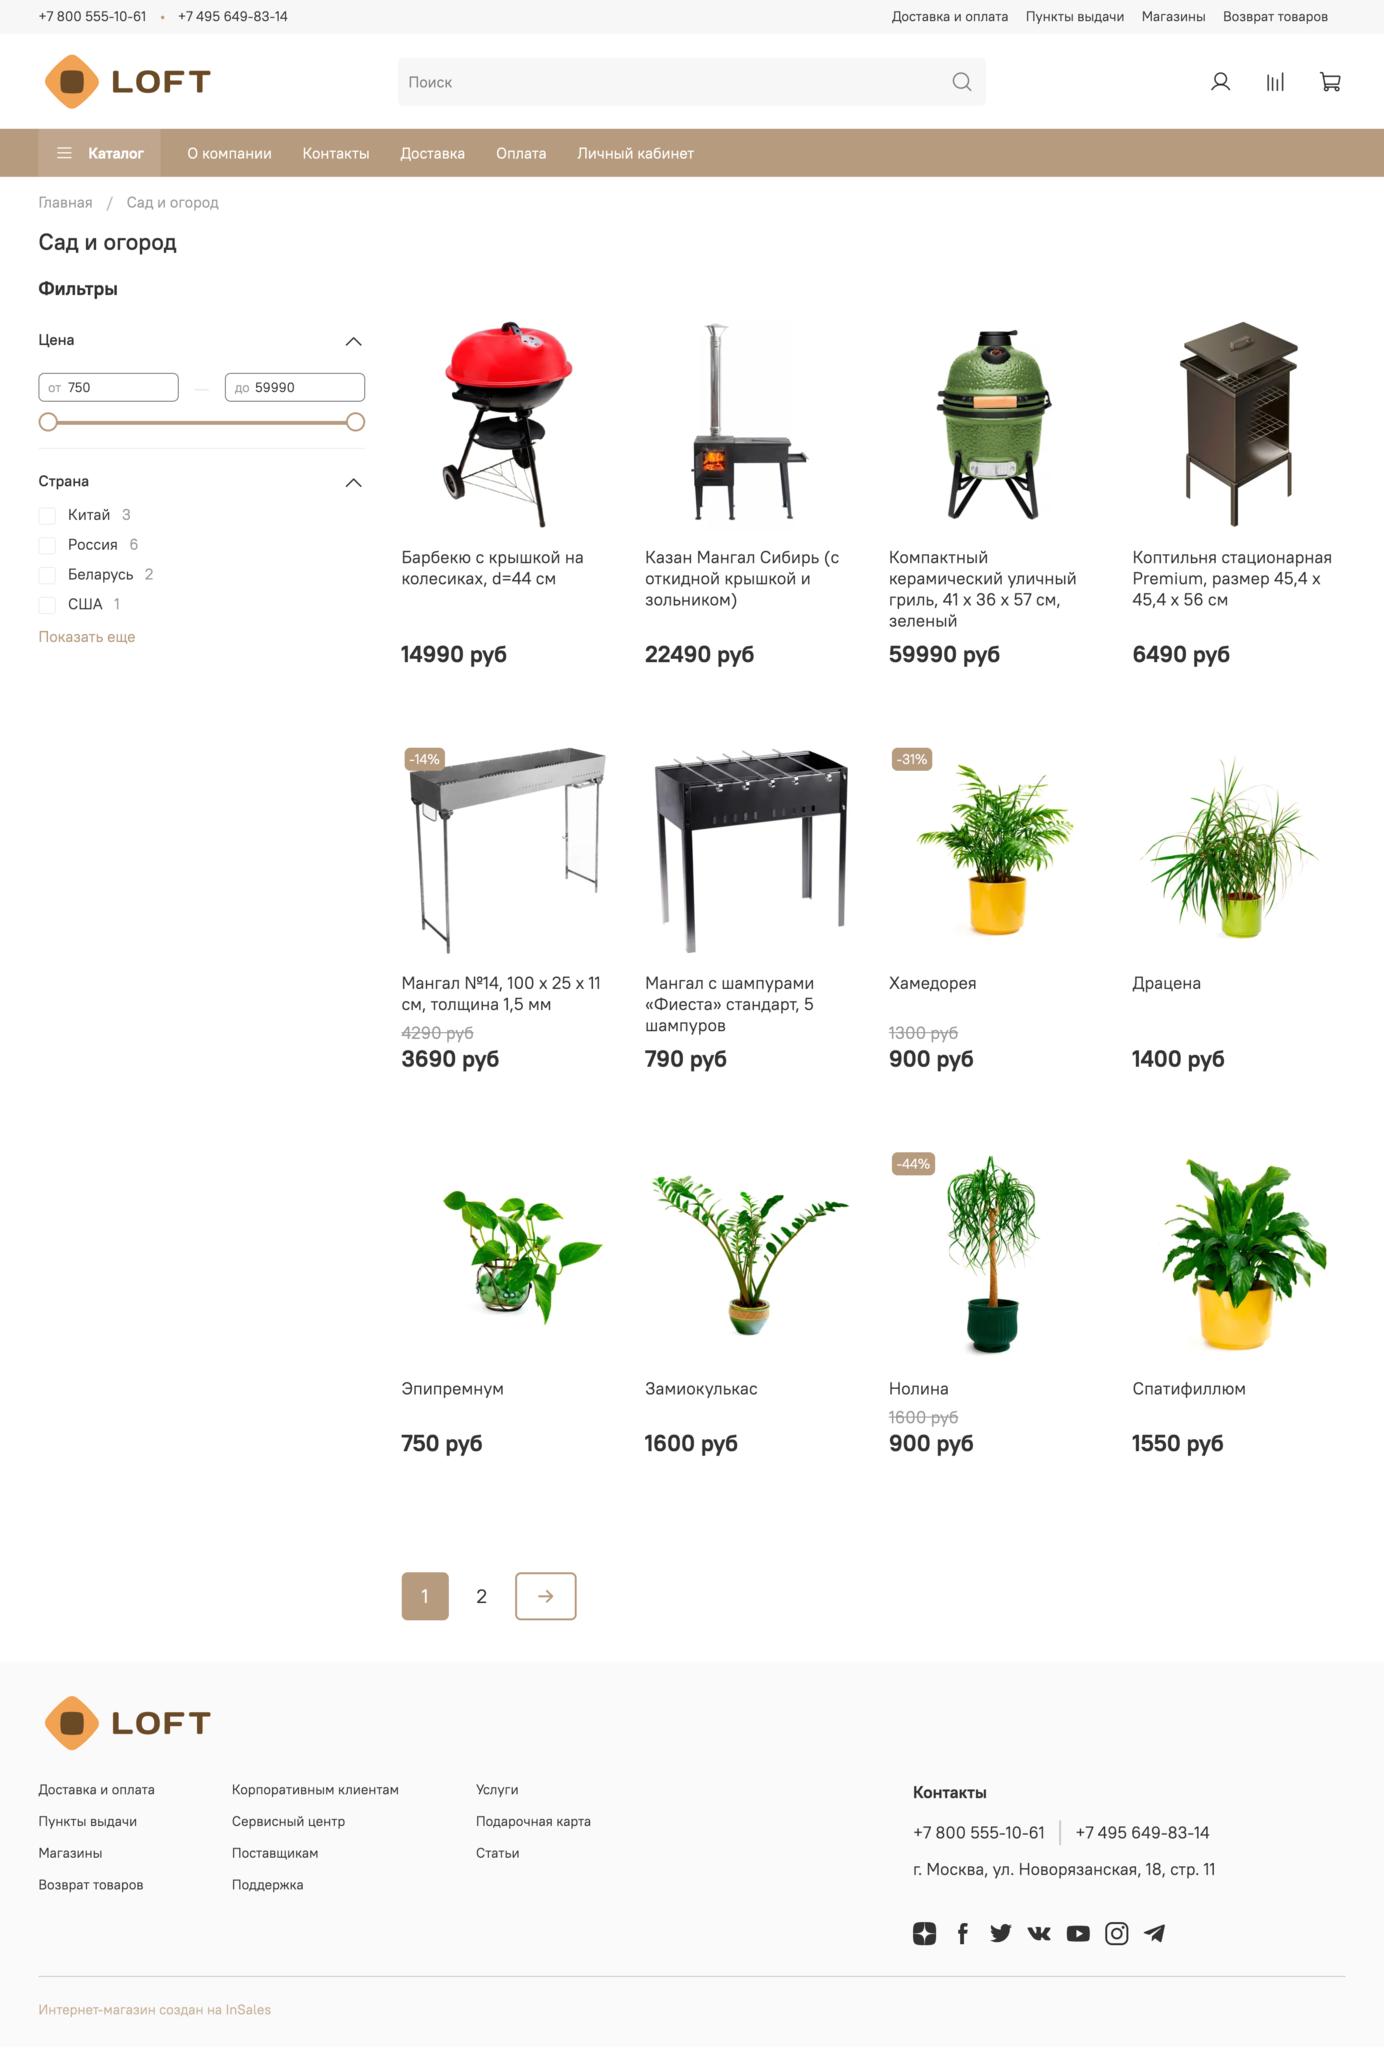 Шаблон интернет магазина - Loft